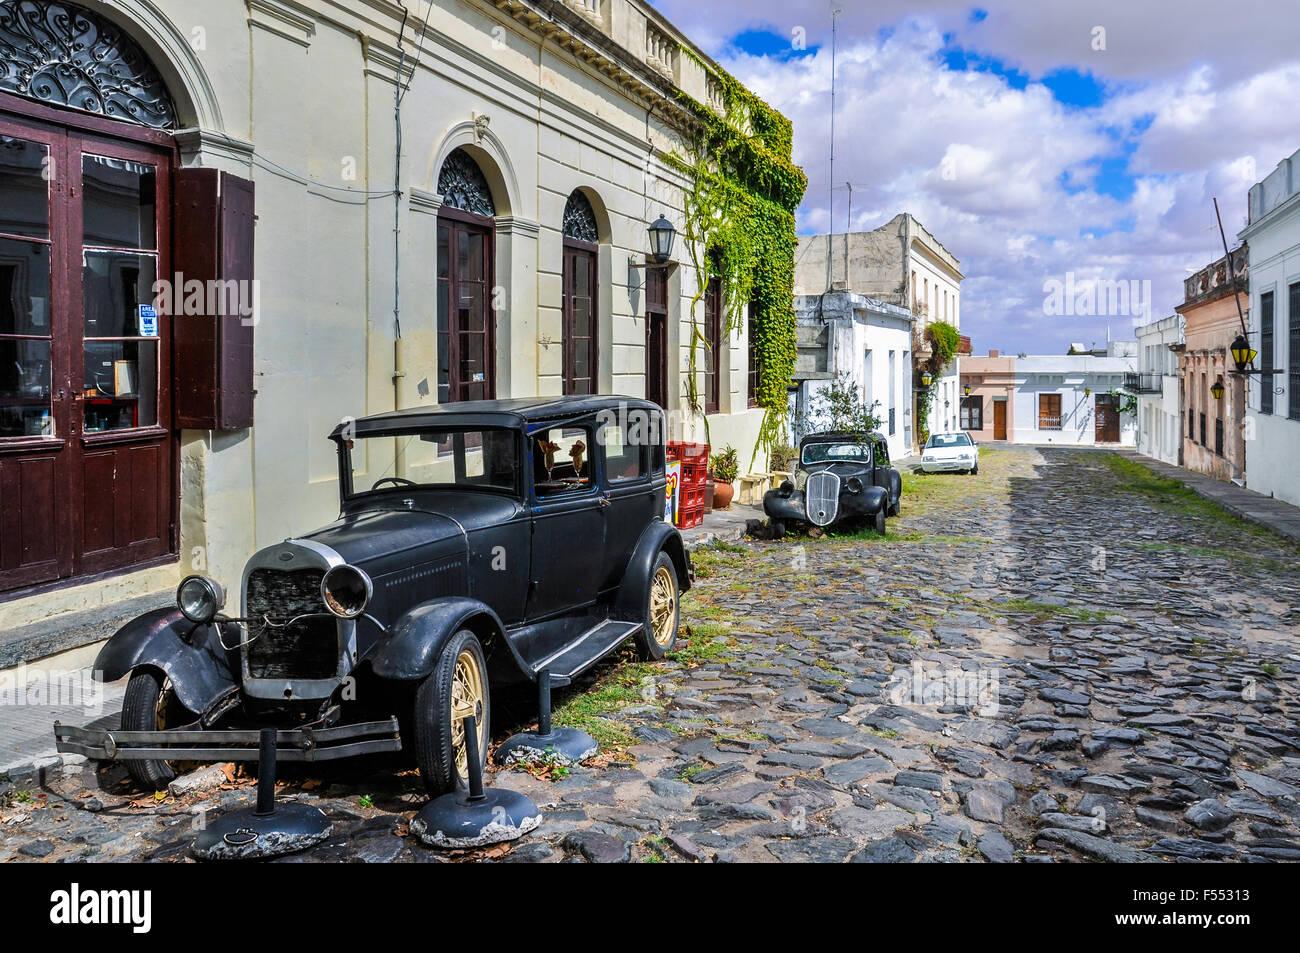 Vieille automobile noir dans la rue de Colonia del Sacramento, une ville coloniale en Uruguay. Photo Stock